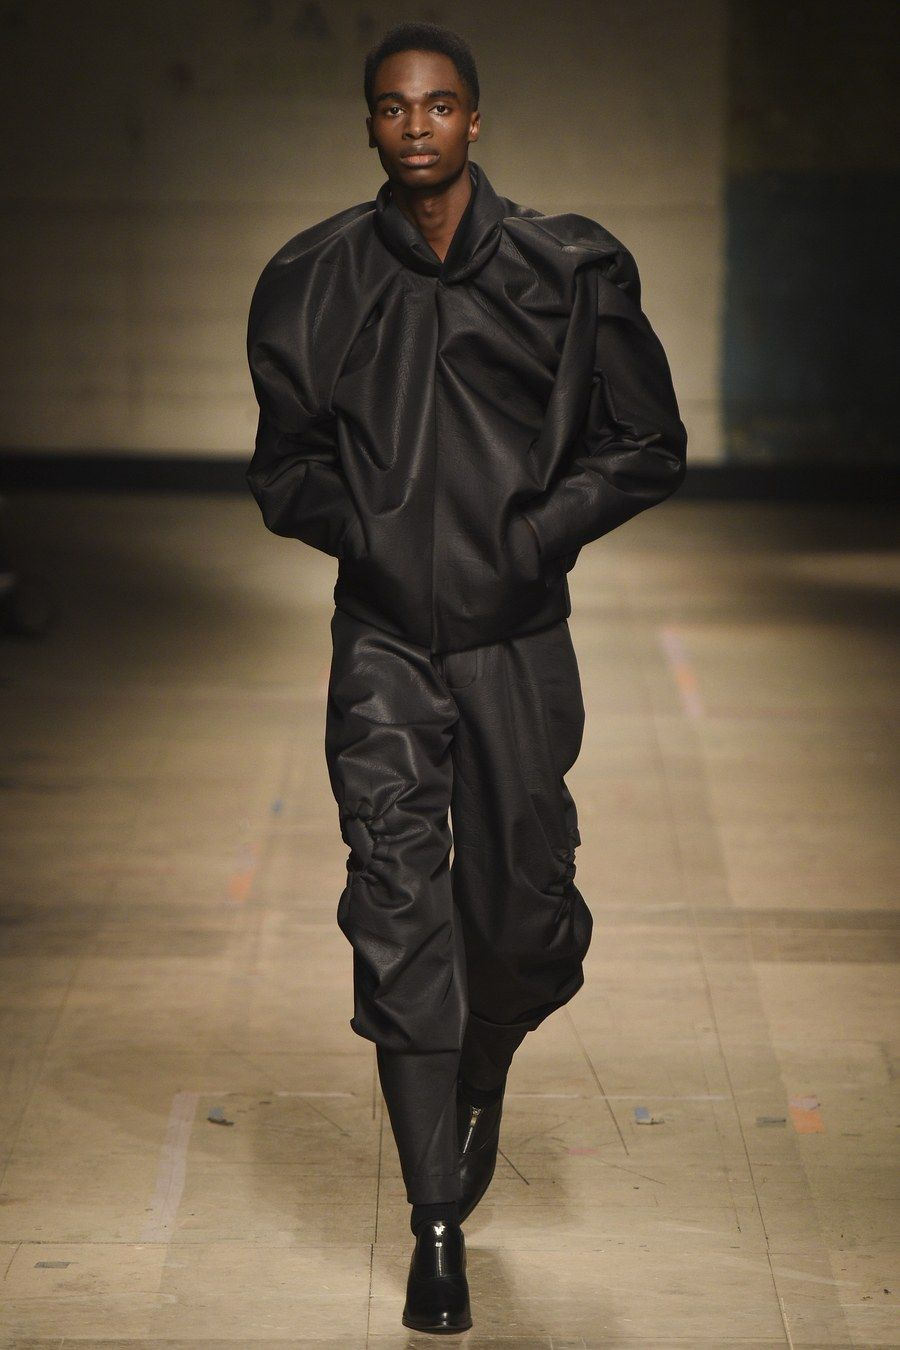 @Man #fall17 #menswear #runway #fashion #london